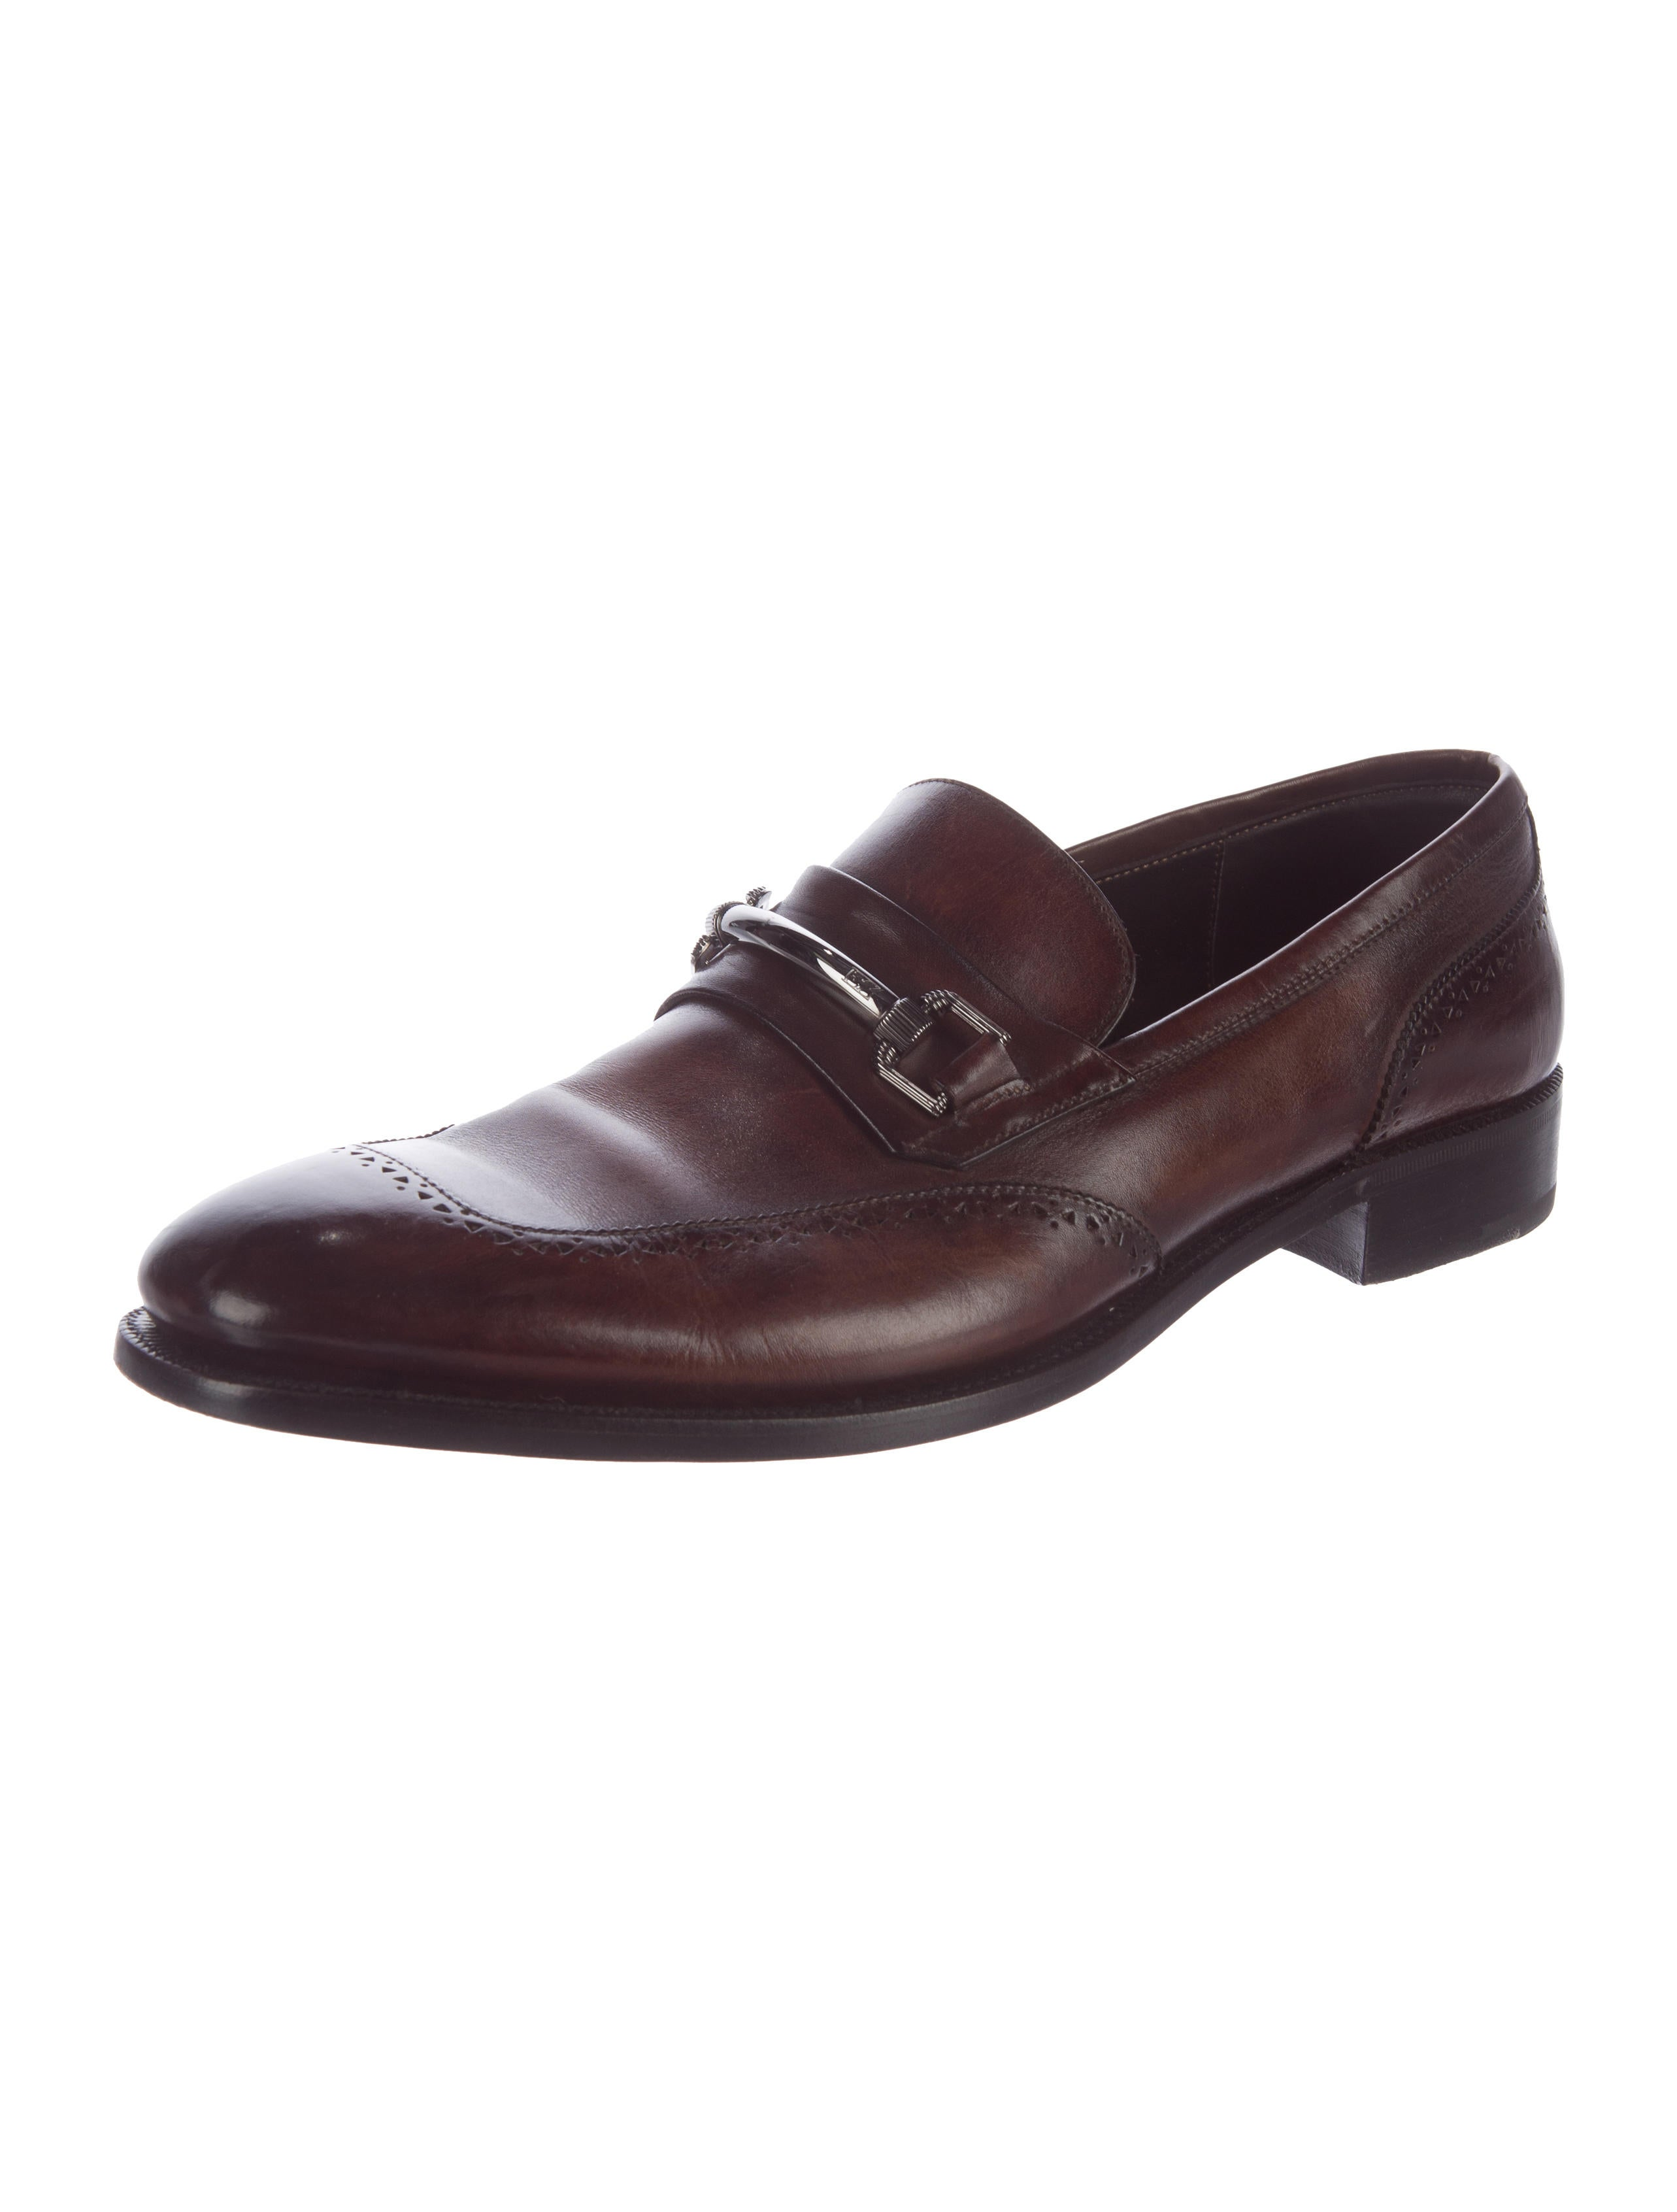 ermenegildo zegna leather dress loafers shoes zgn24079